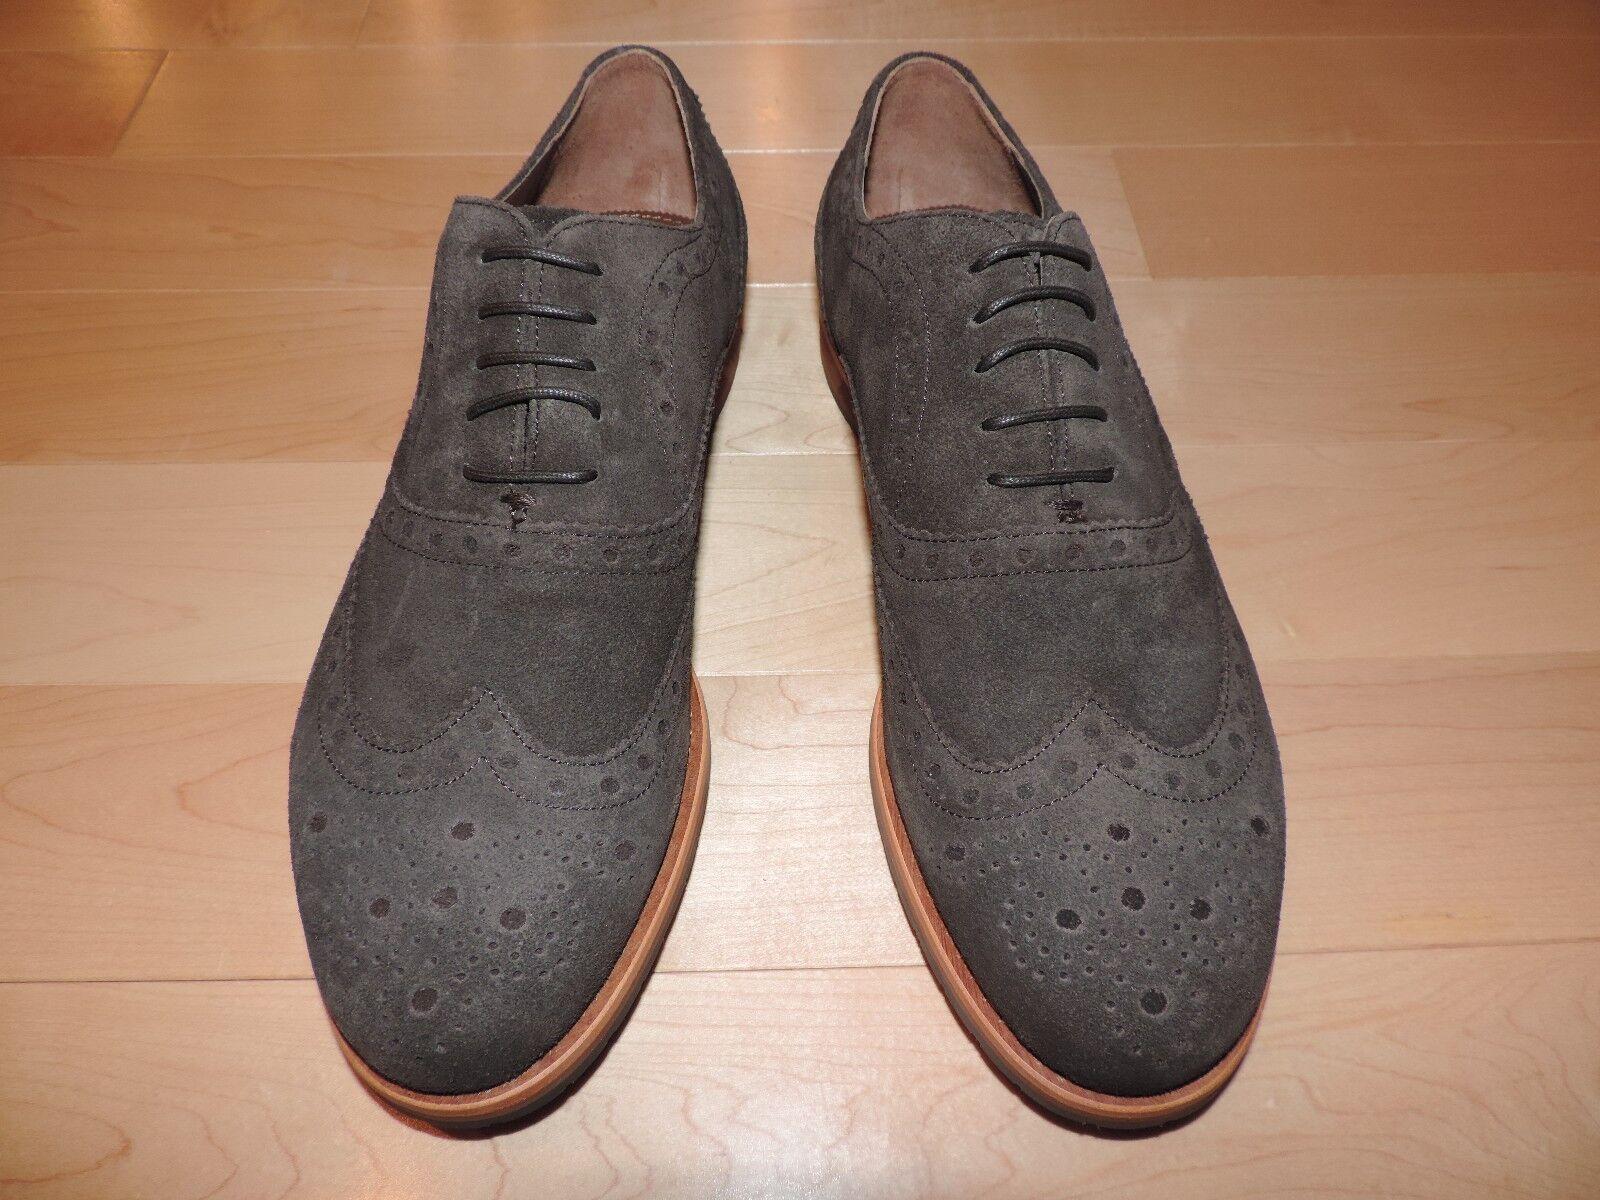 Hugo Boss CAURO-X Dark Brown Suede Suede Suede Pelle Dress Perforated Wingtip Shoes 6 7 8 162bf9